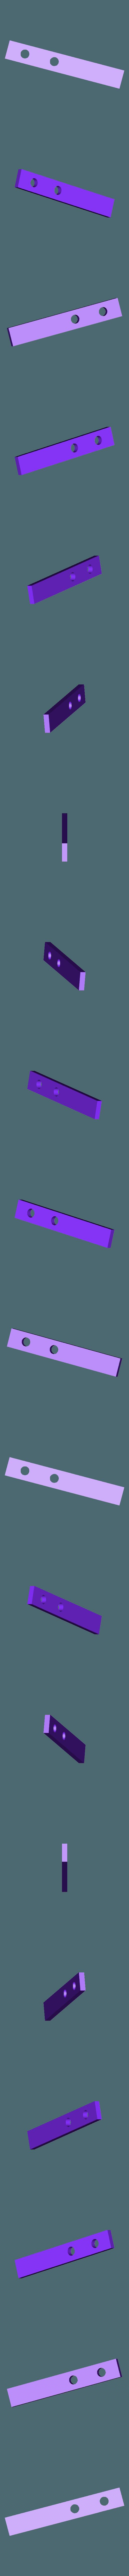 short_leg_1.stl Download free STL file Firestorm Quantum Splicer • 3D printable design, poblocki1982